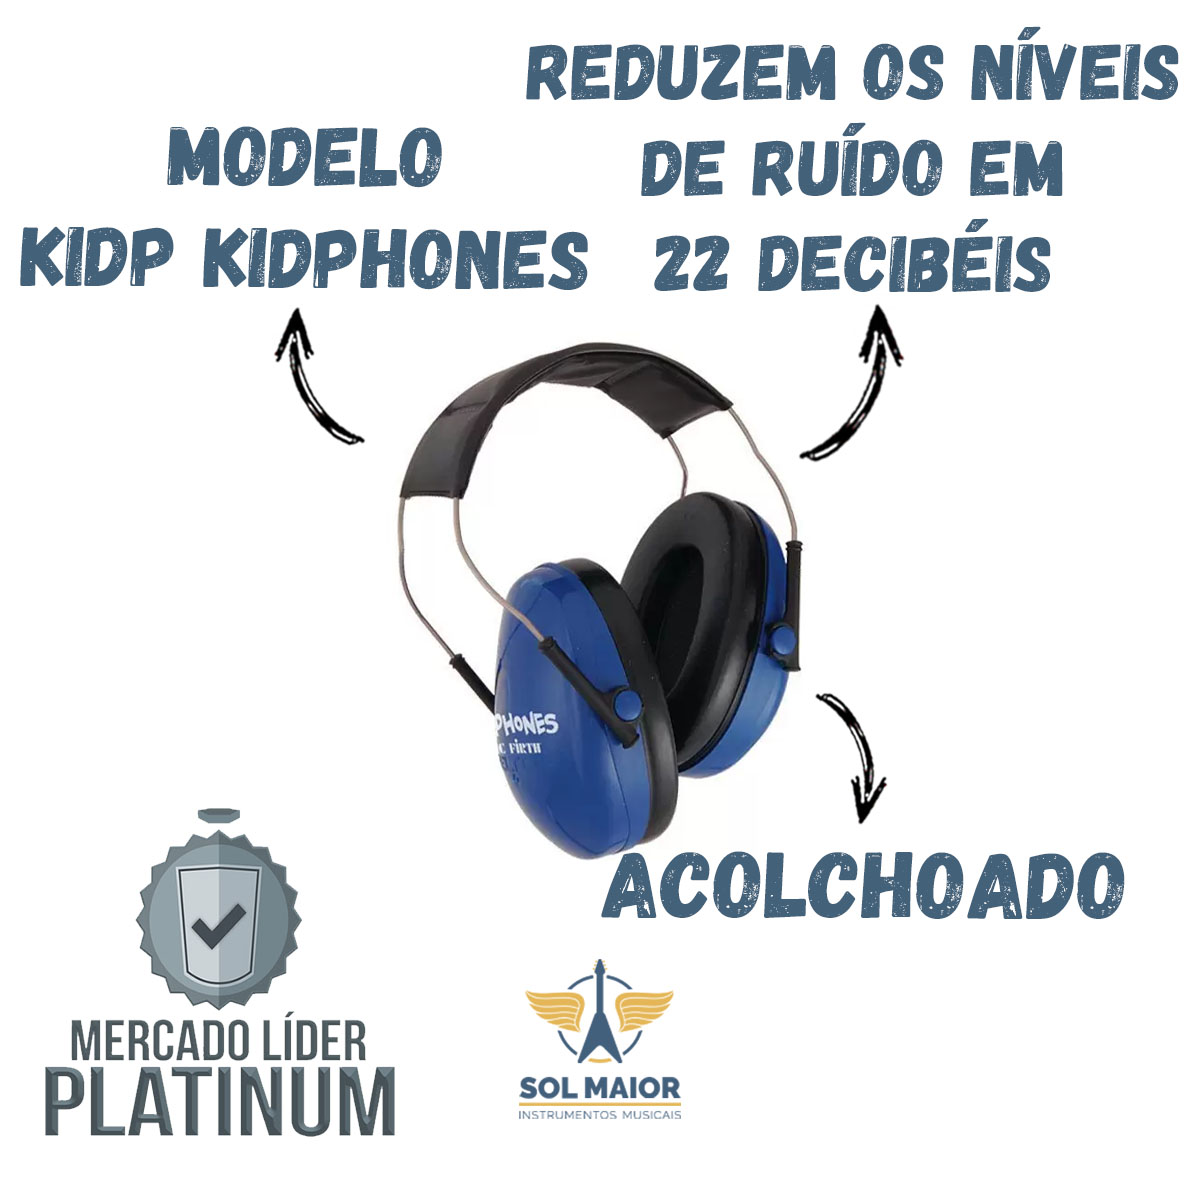 Protetor de Ouvido Redutor de Ruido Infantil KidPhones KidP